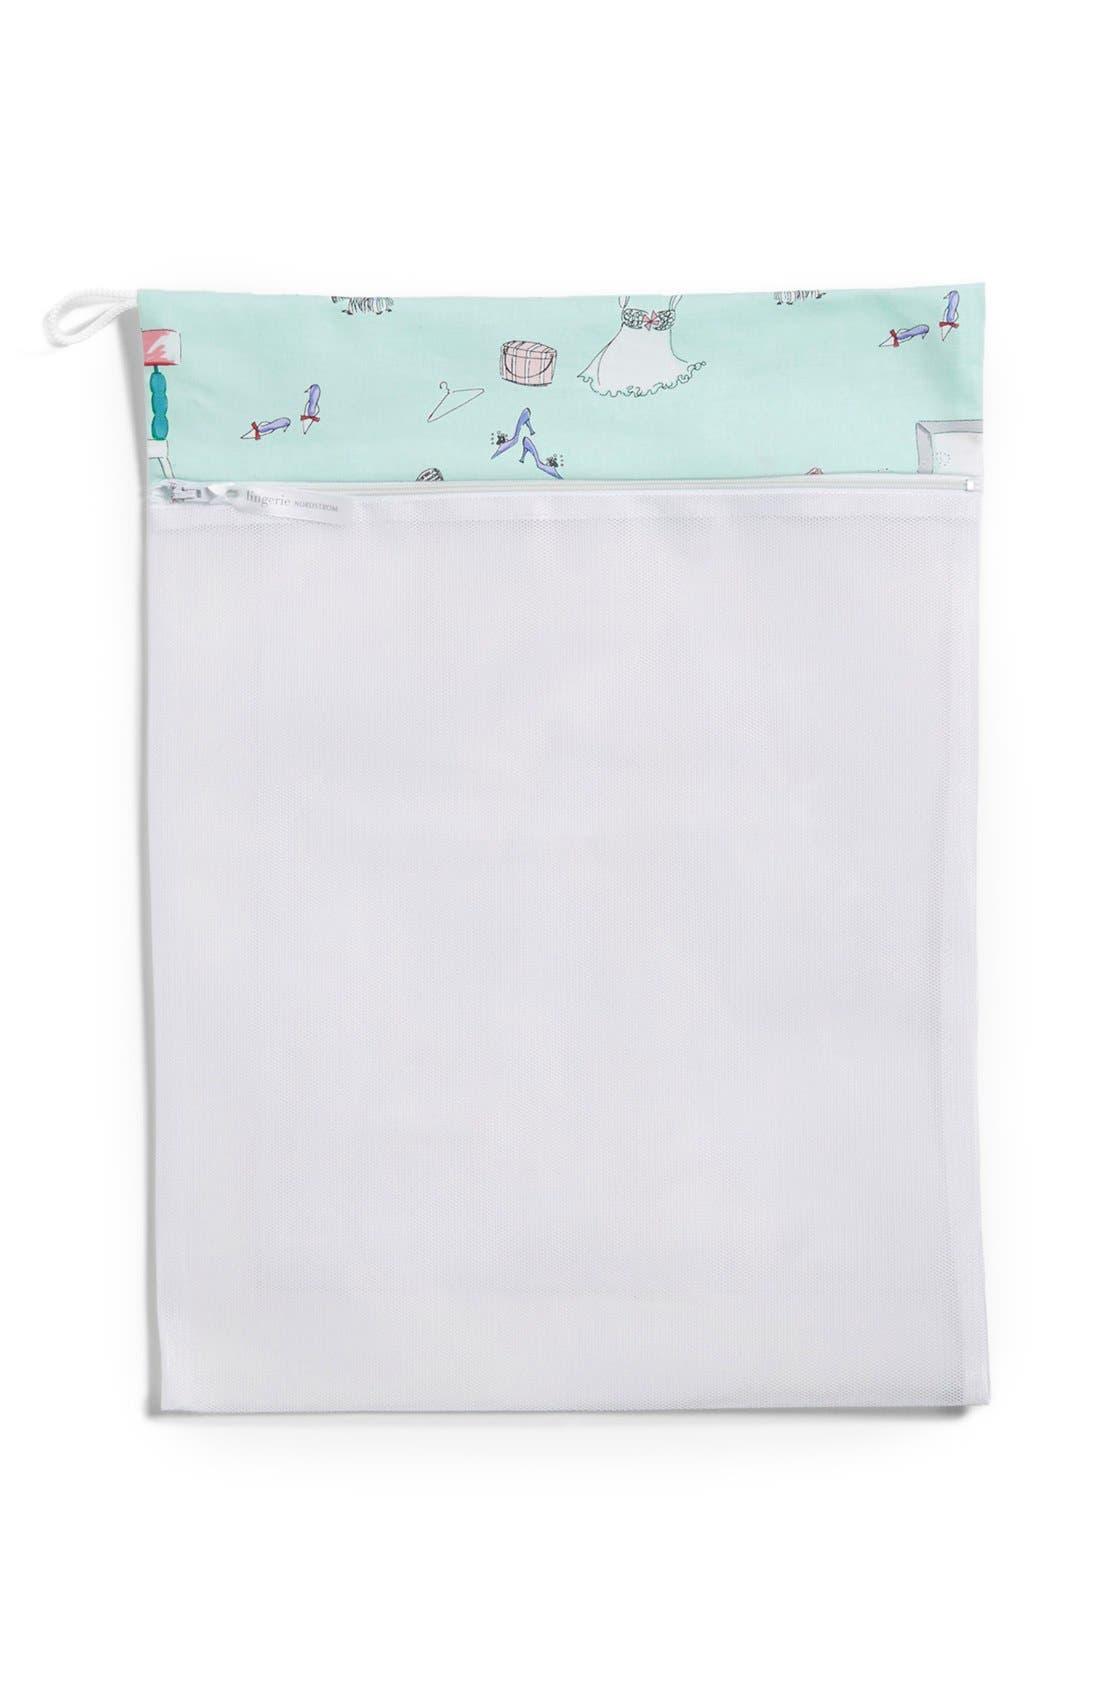 Main Image - Nordstrom Intimates Print Trim Lingerie Wash Bag